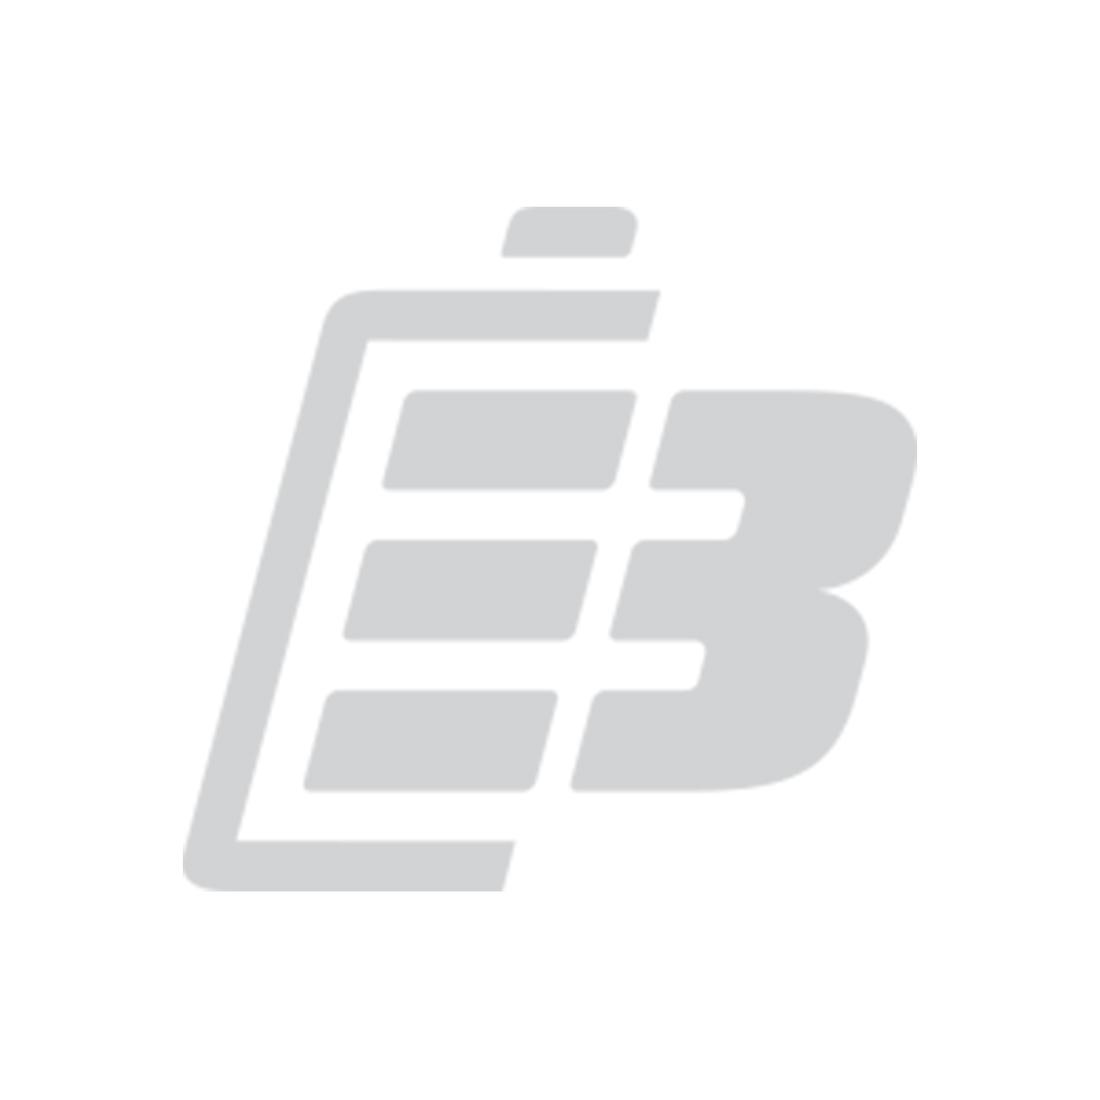 Smartphone battery Microsoft Lumia 532_1